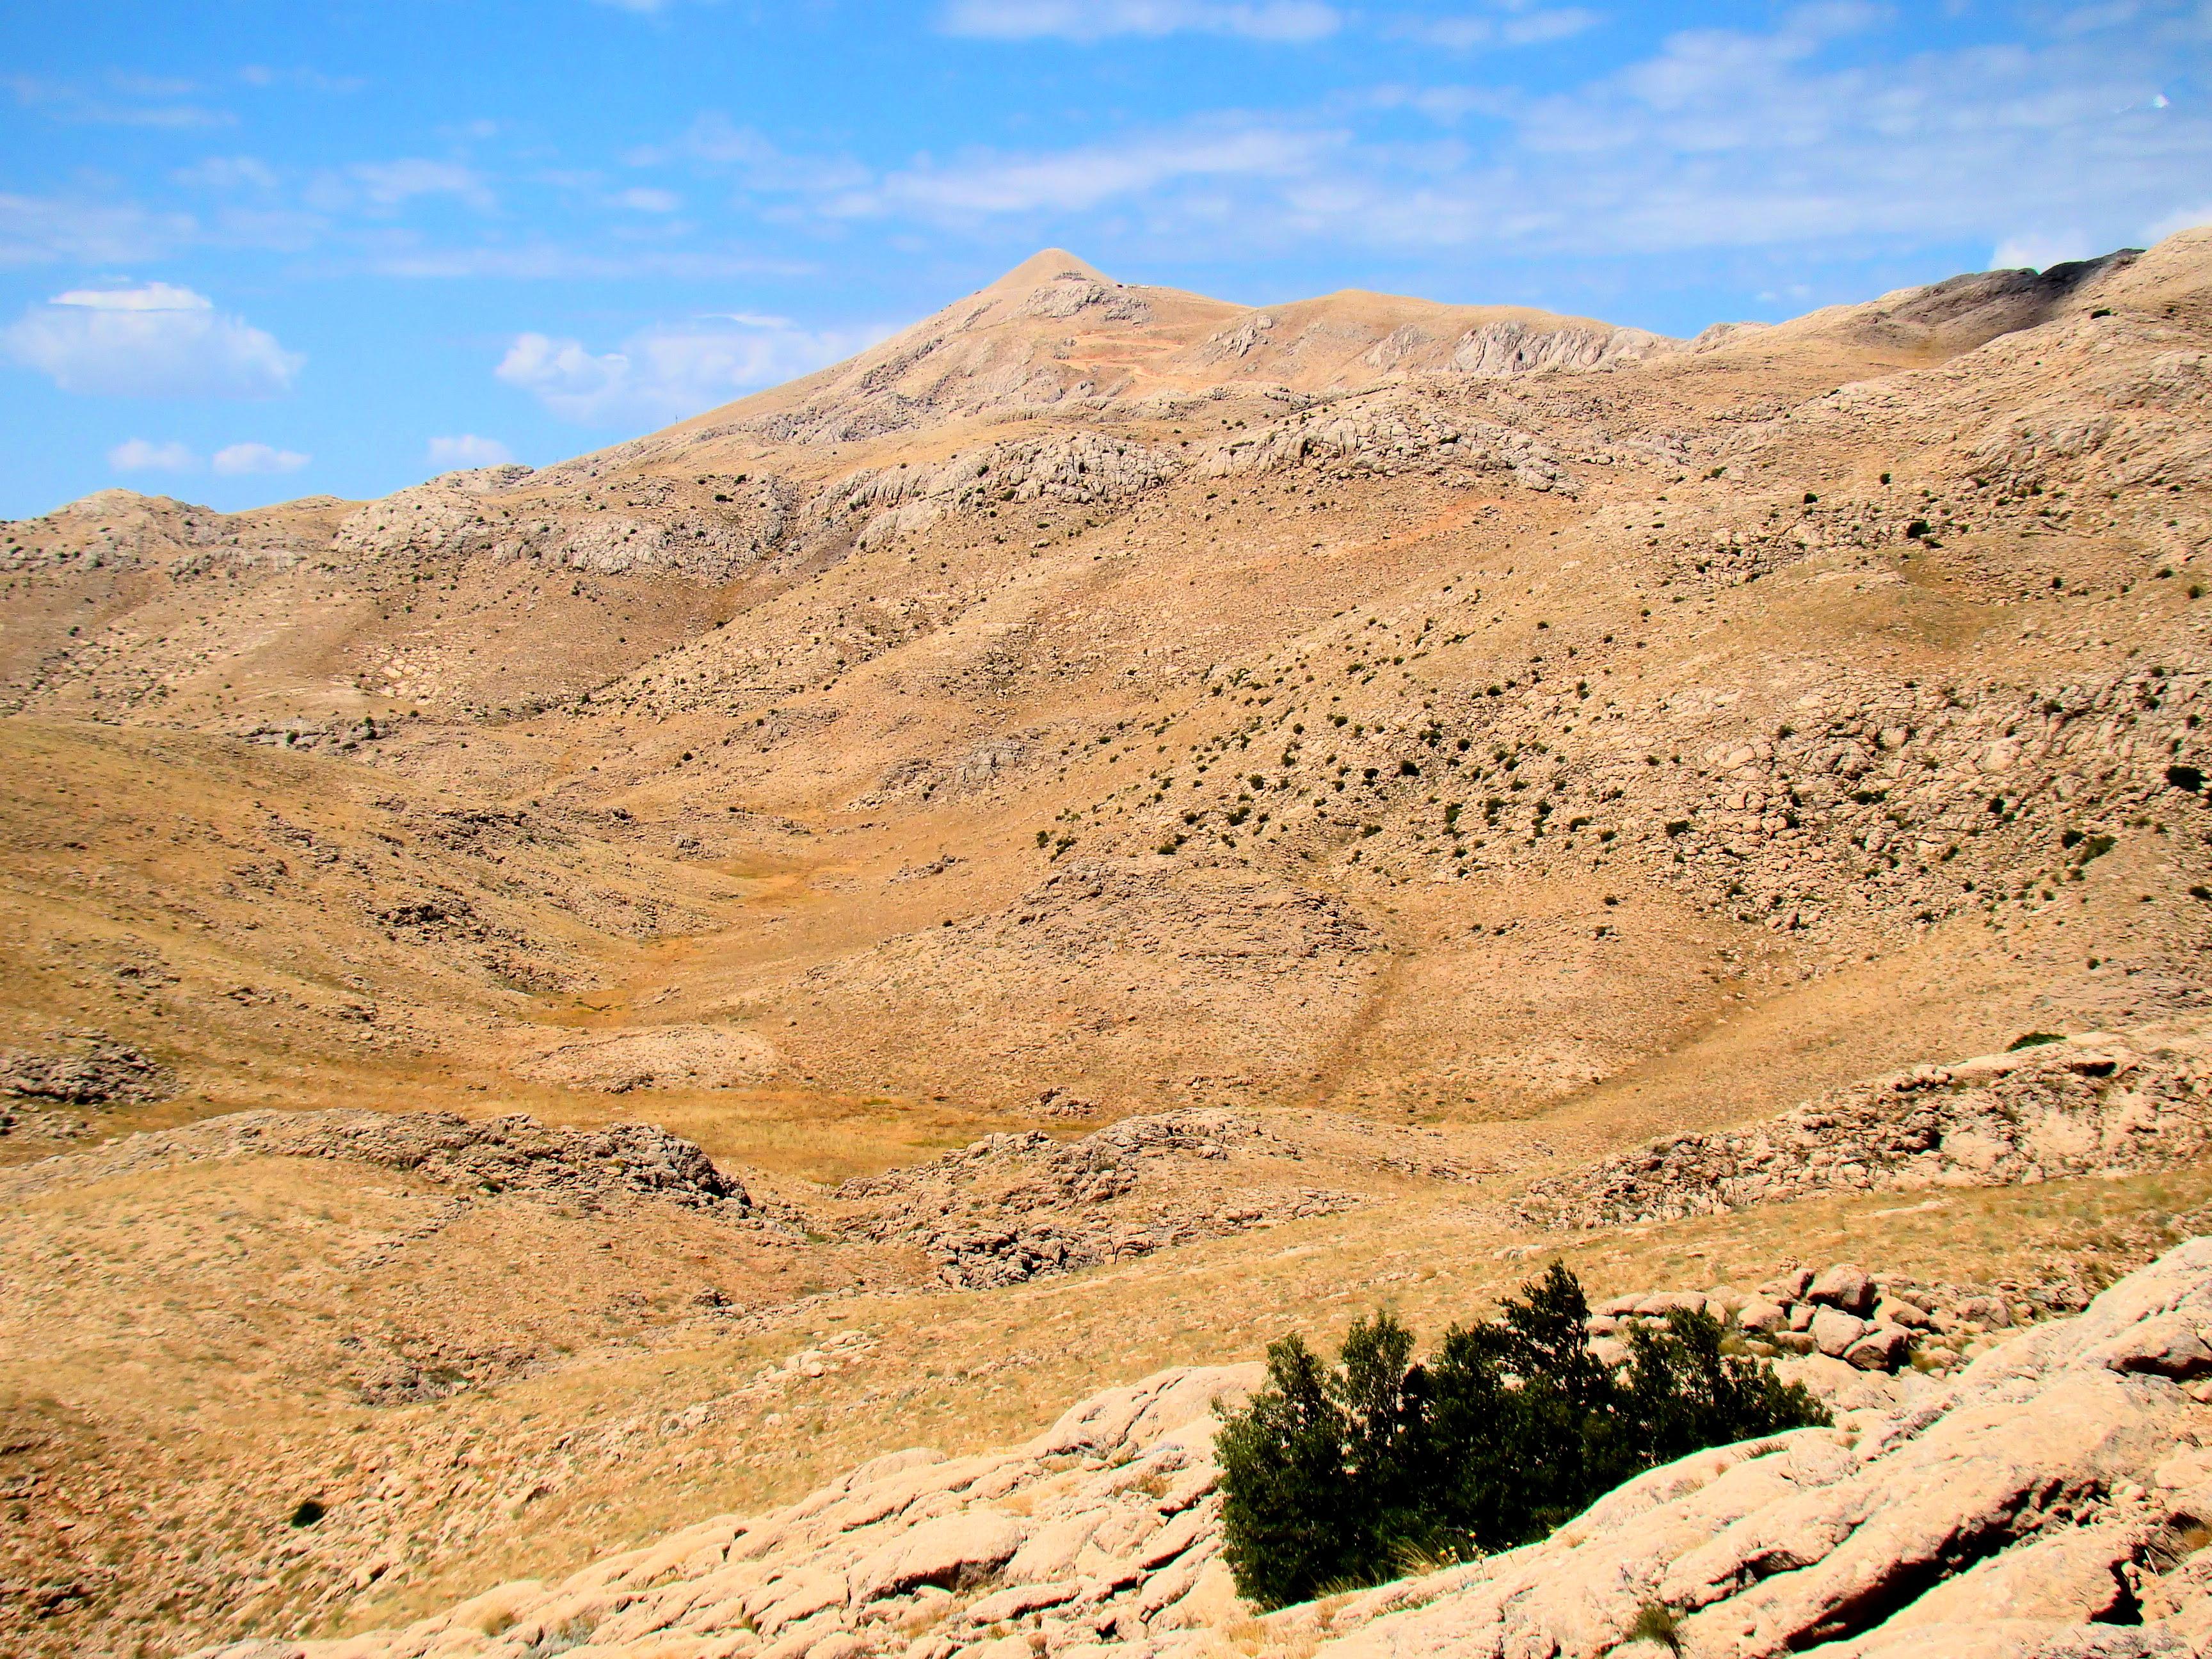 http://upload.wikimedia.org/wikipedia/commons/7/7d/Mount_Nemrut_2134m_From_Northeast.JPG